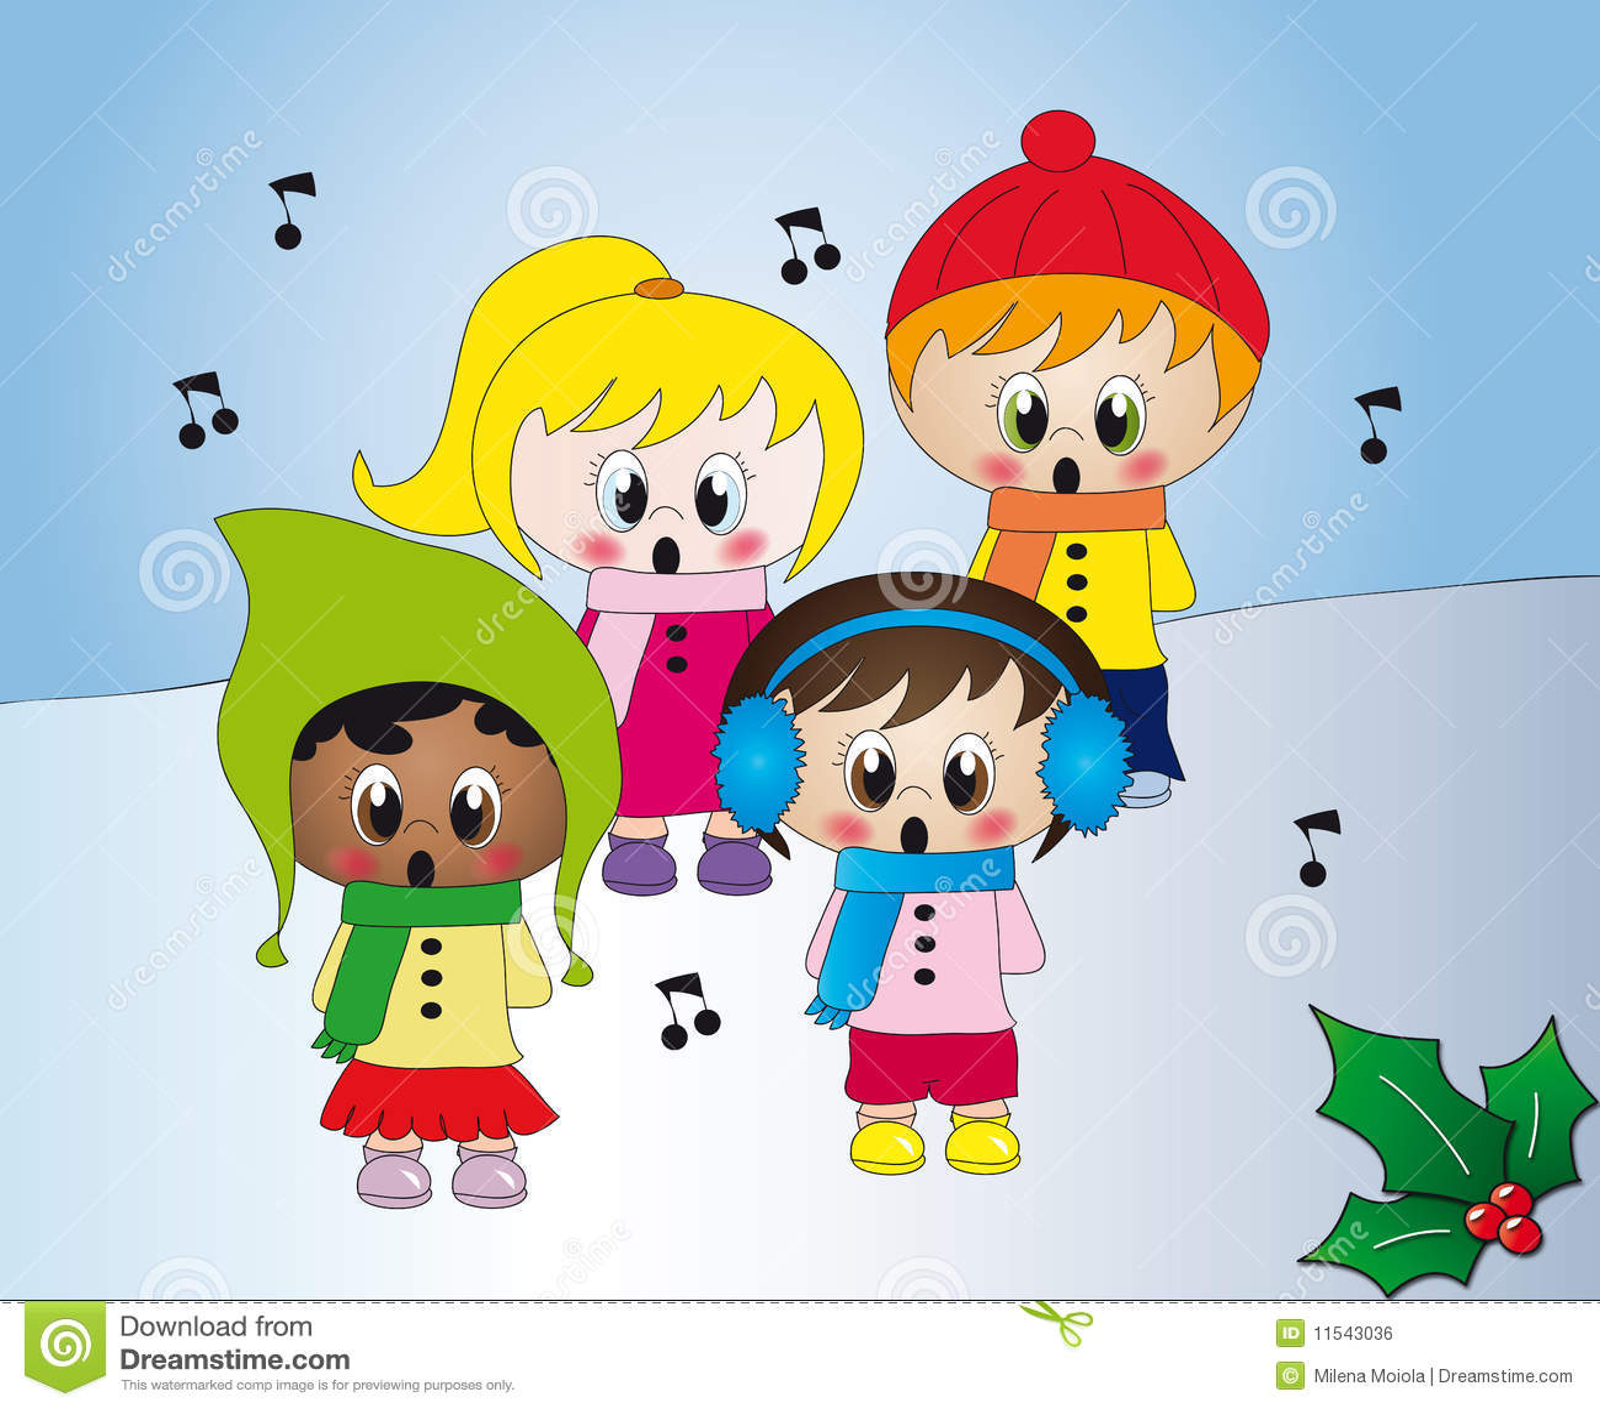 how to make a choir of three singing carols